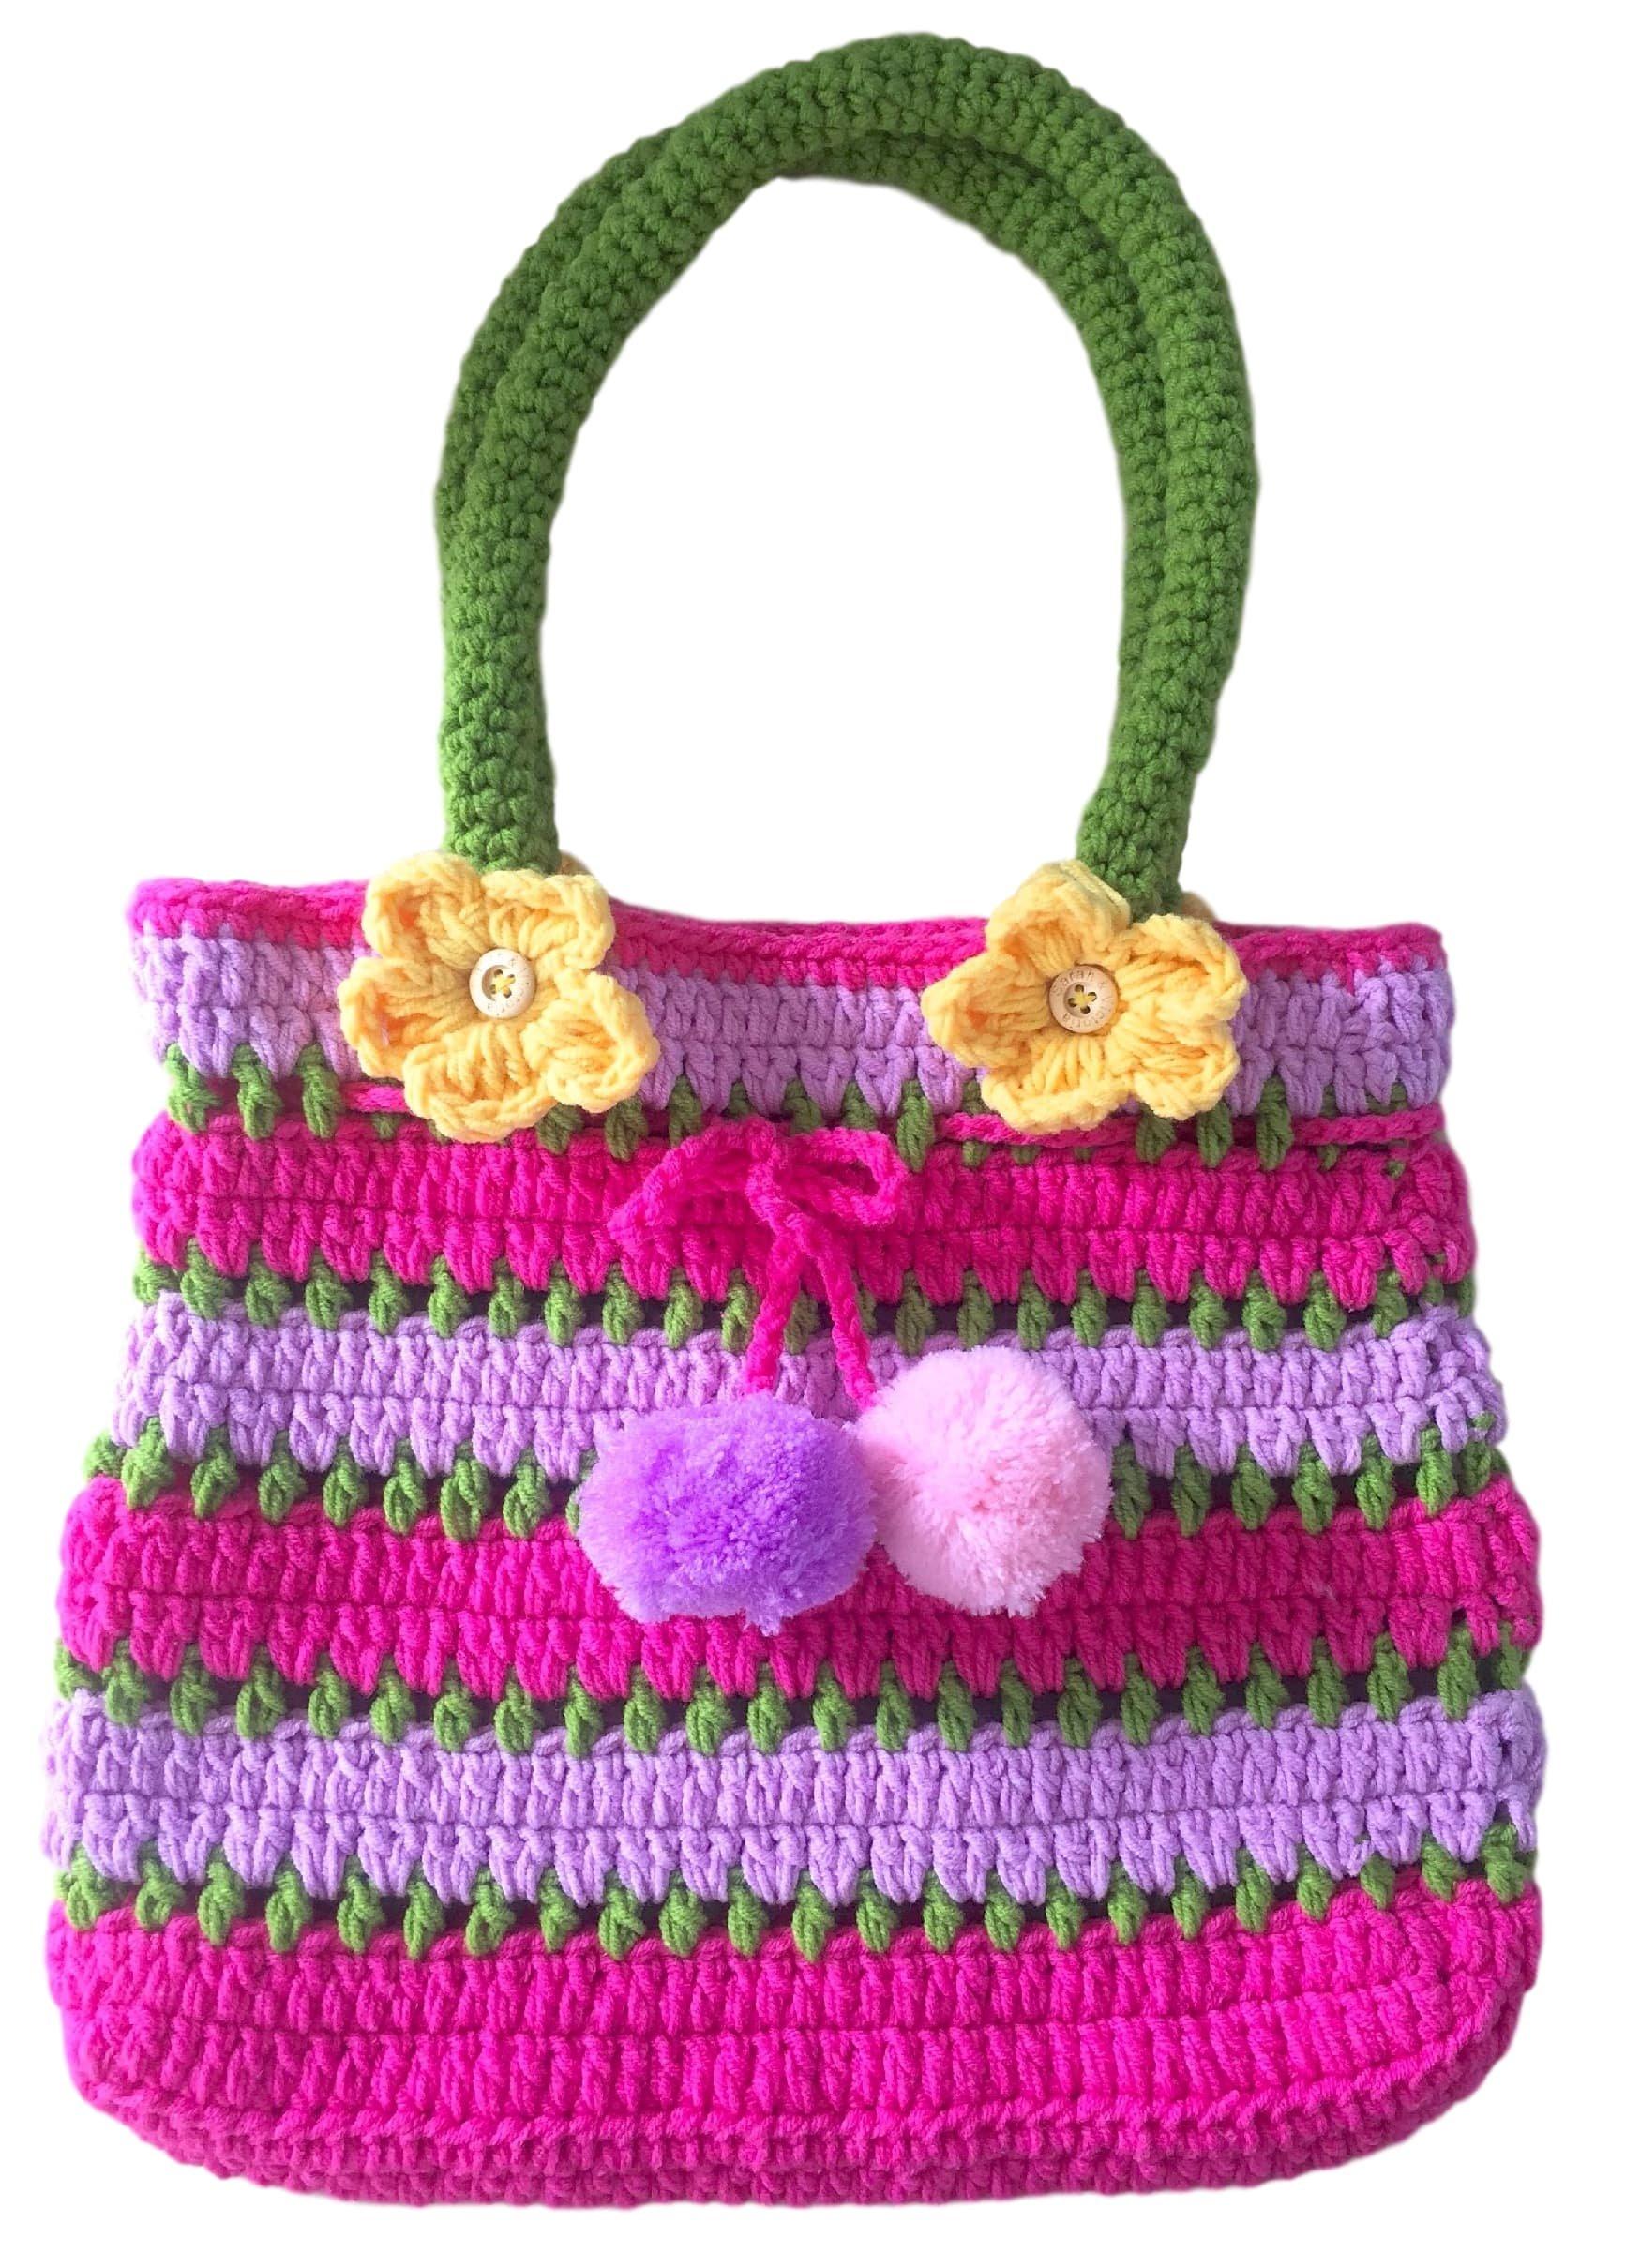 Pom Pom Handbag, Little Girls Purse, Pink & Purple, Soft Handmade Crochet, Drawstring Closure, Flowers Front & Back, Gifts For Girls, Dress-Up & Play, So Beautiful & Unique ... Just Like Her